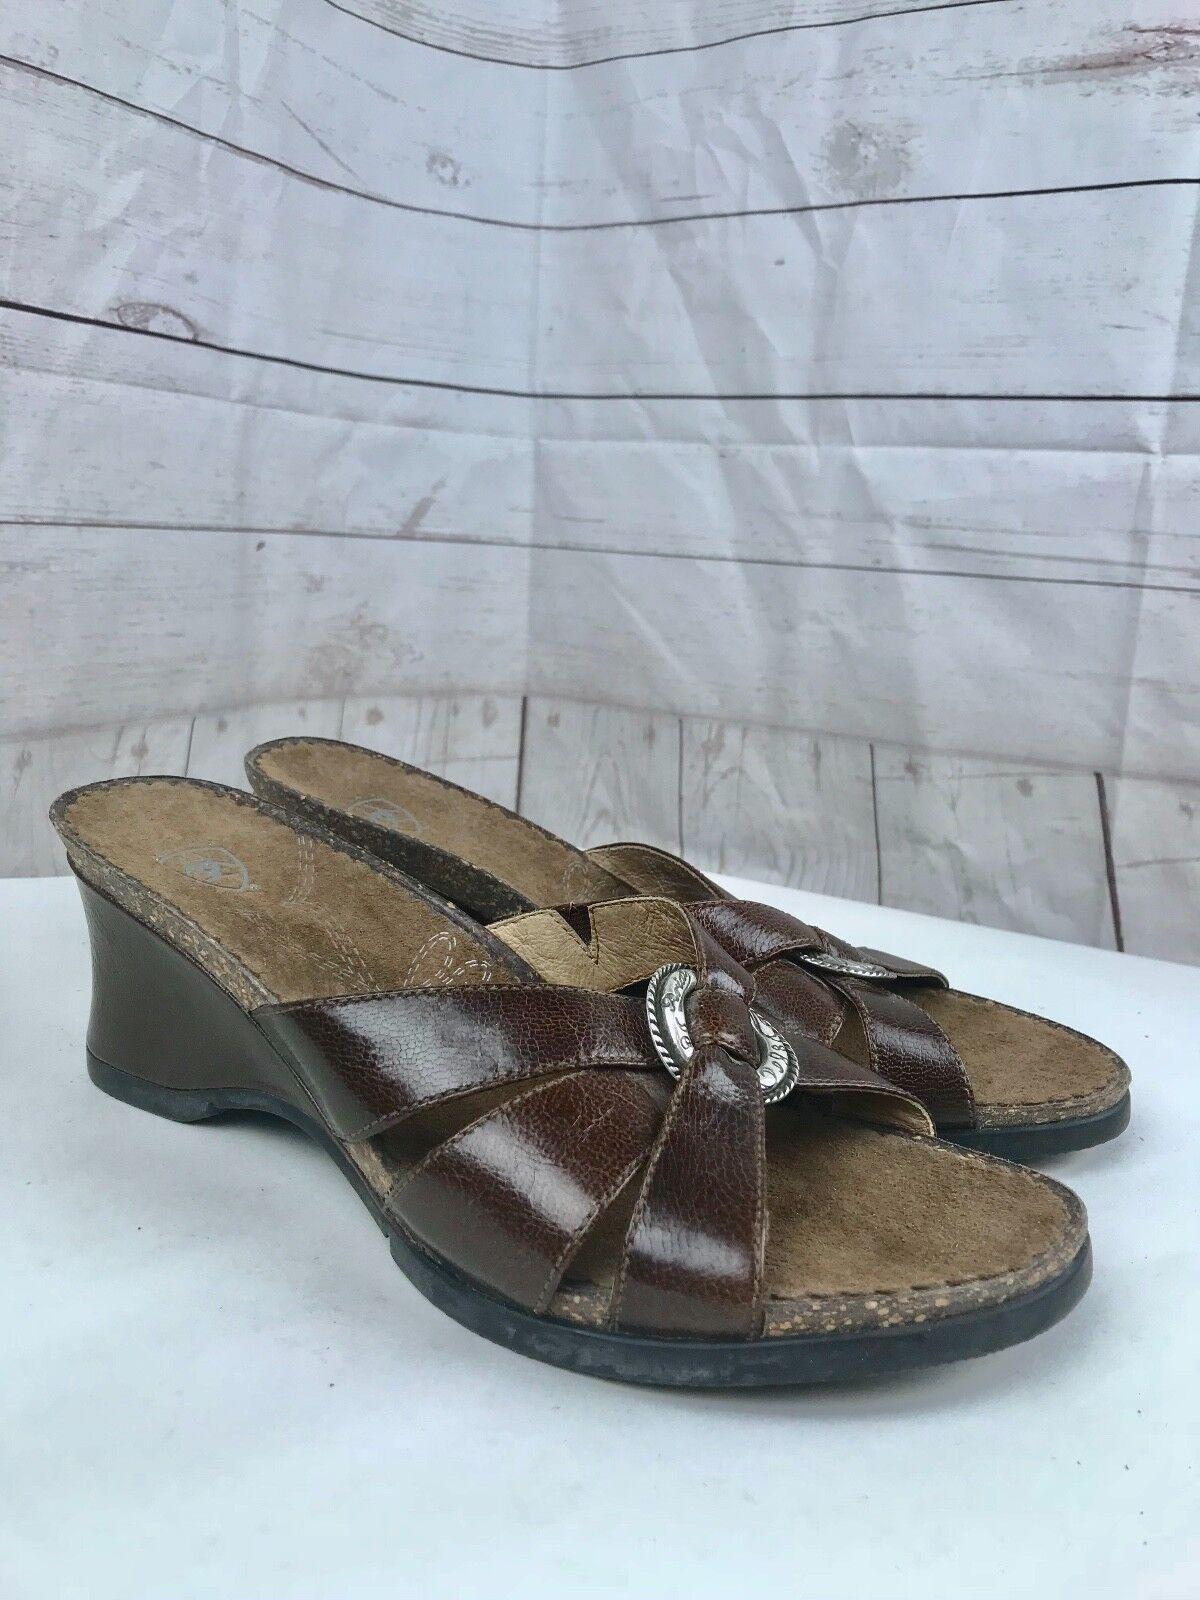 Ariat Women's Brown Leather Cork Embellishment Strap Wedge Heel Sandal Size 8